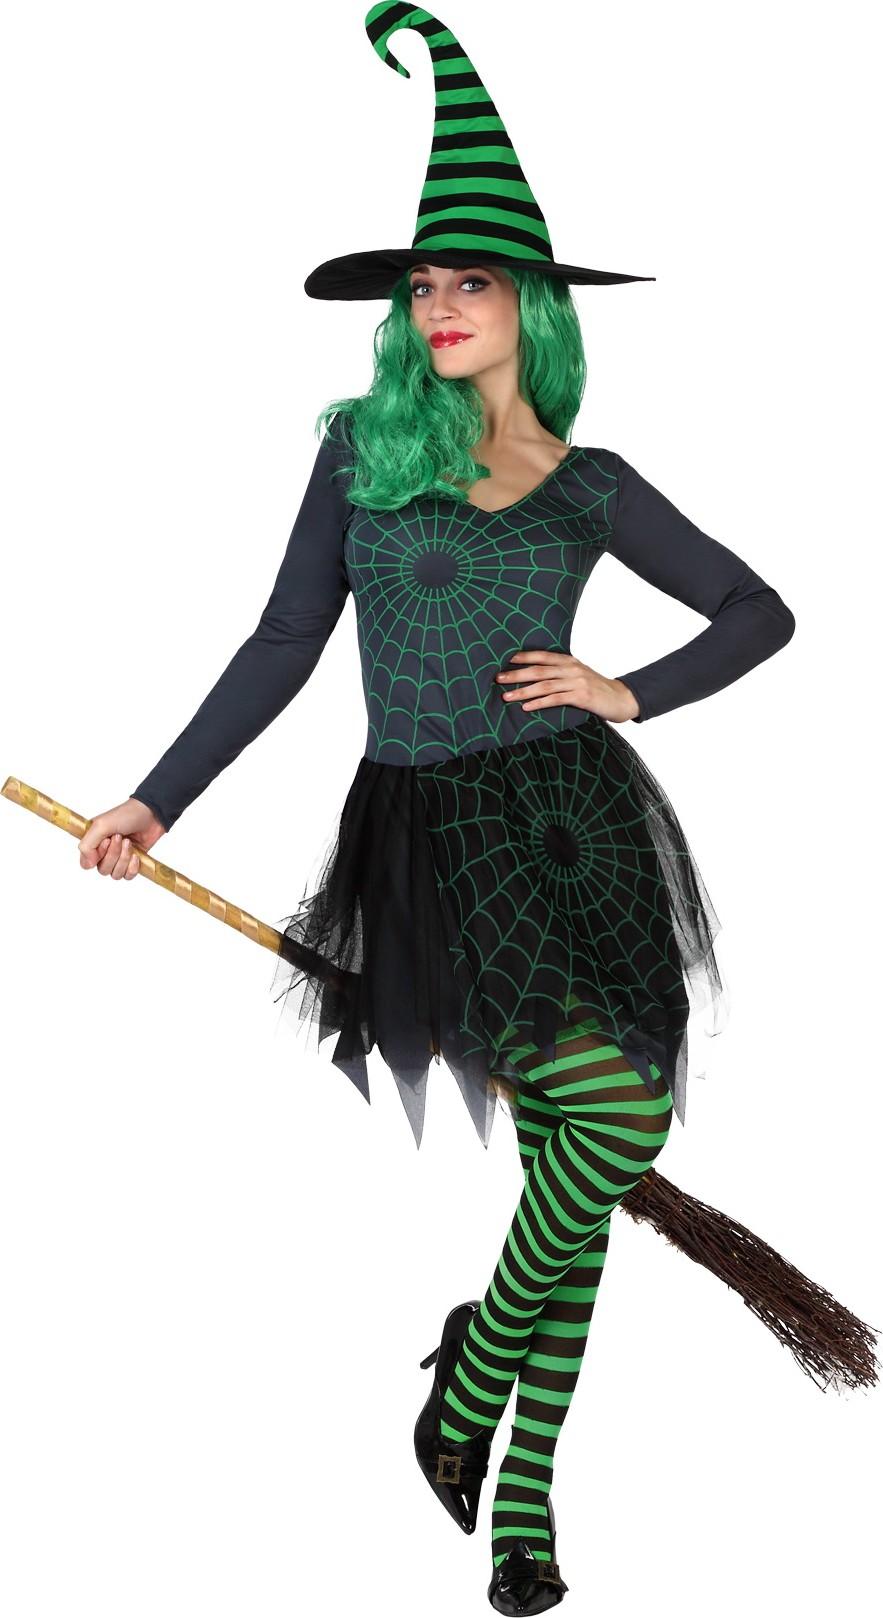 530c3804a Disfraz bruja telaraña verde mujer Halloween